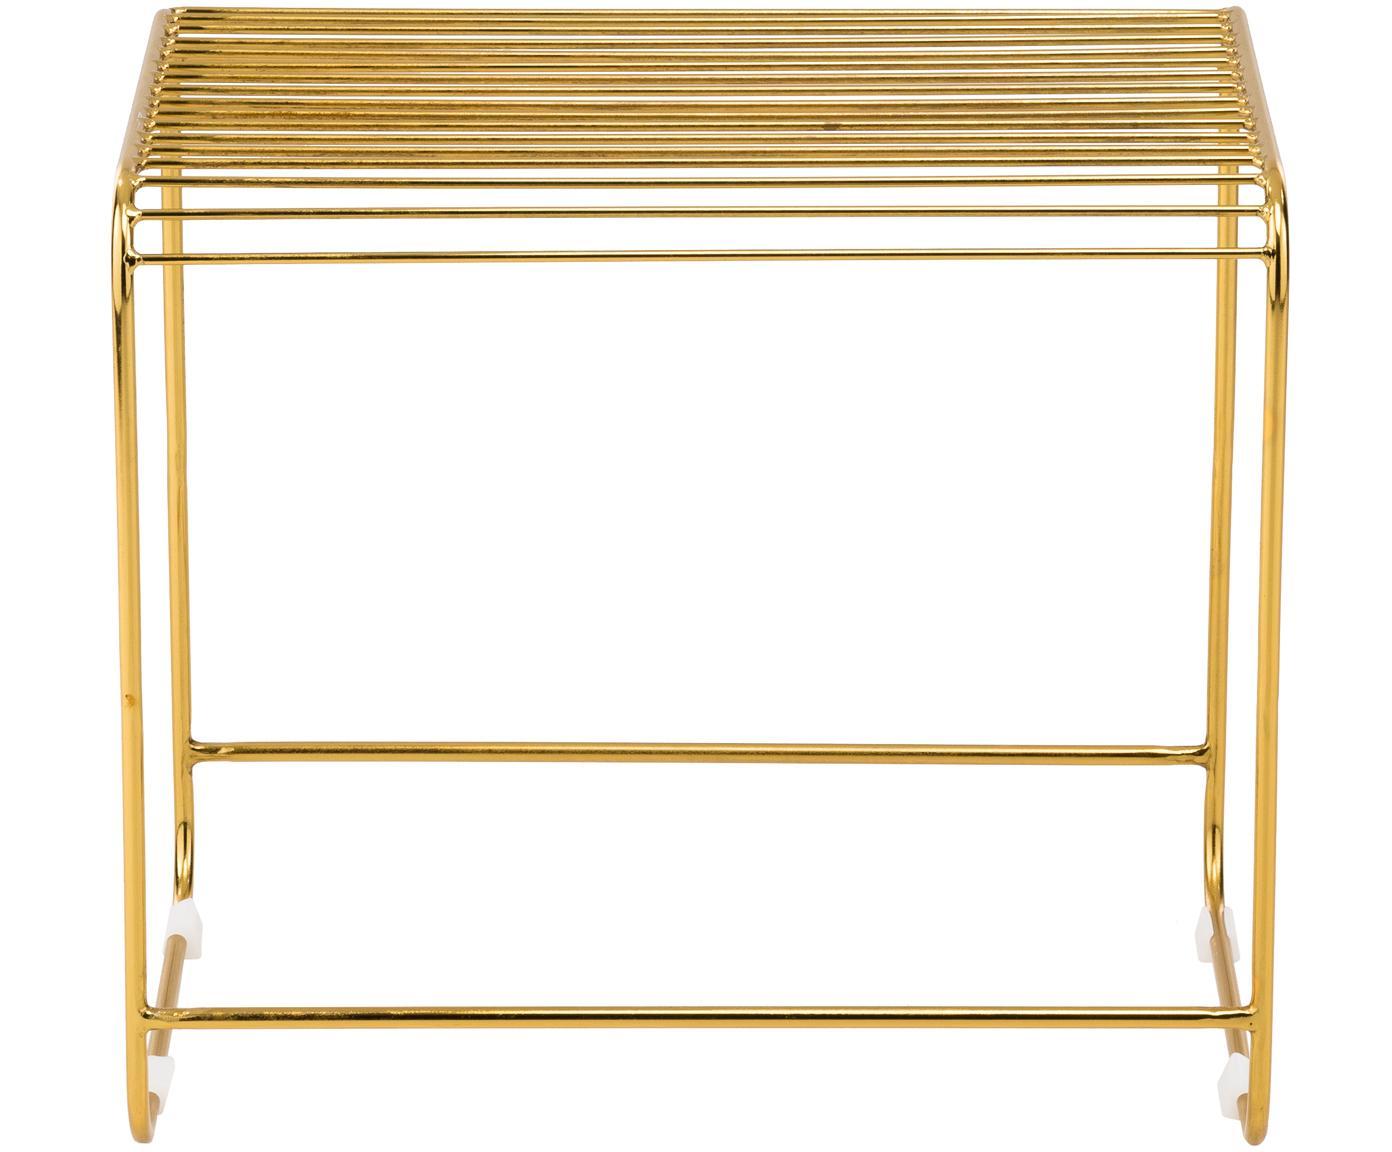 Hocker / Beistelltisch Wire, Metall, lackiert, Gold, 50 x 45 cm